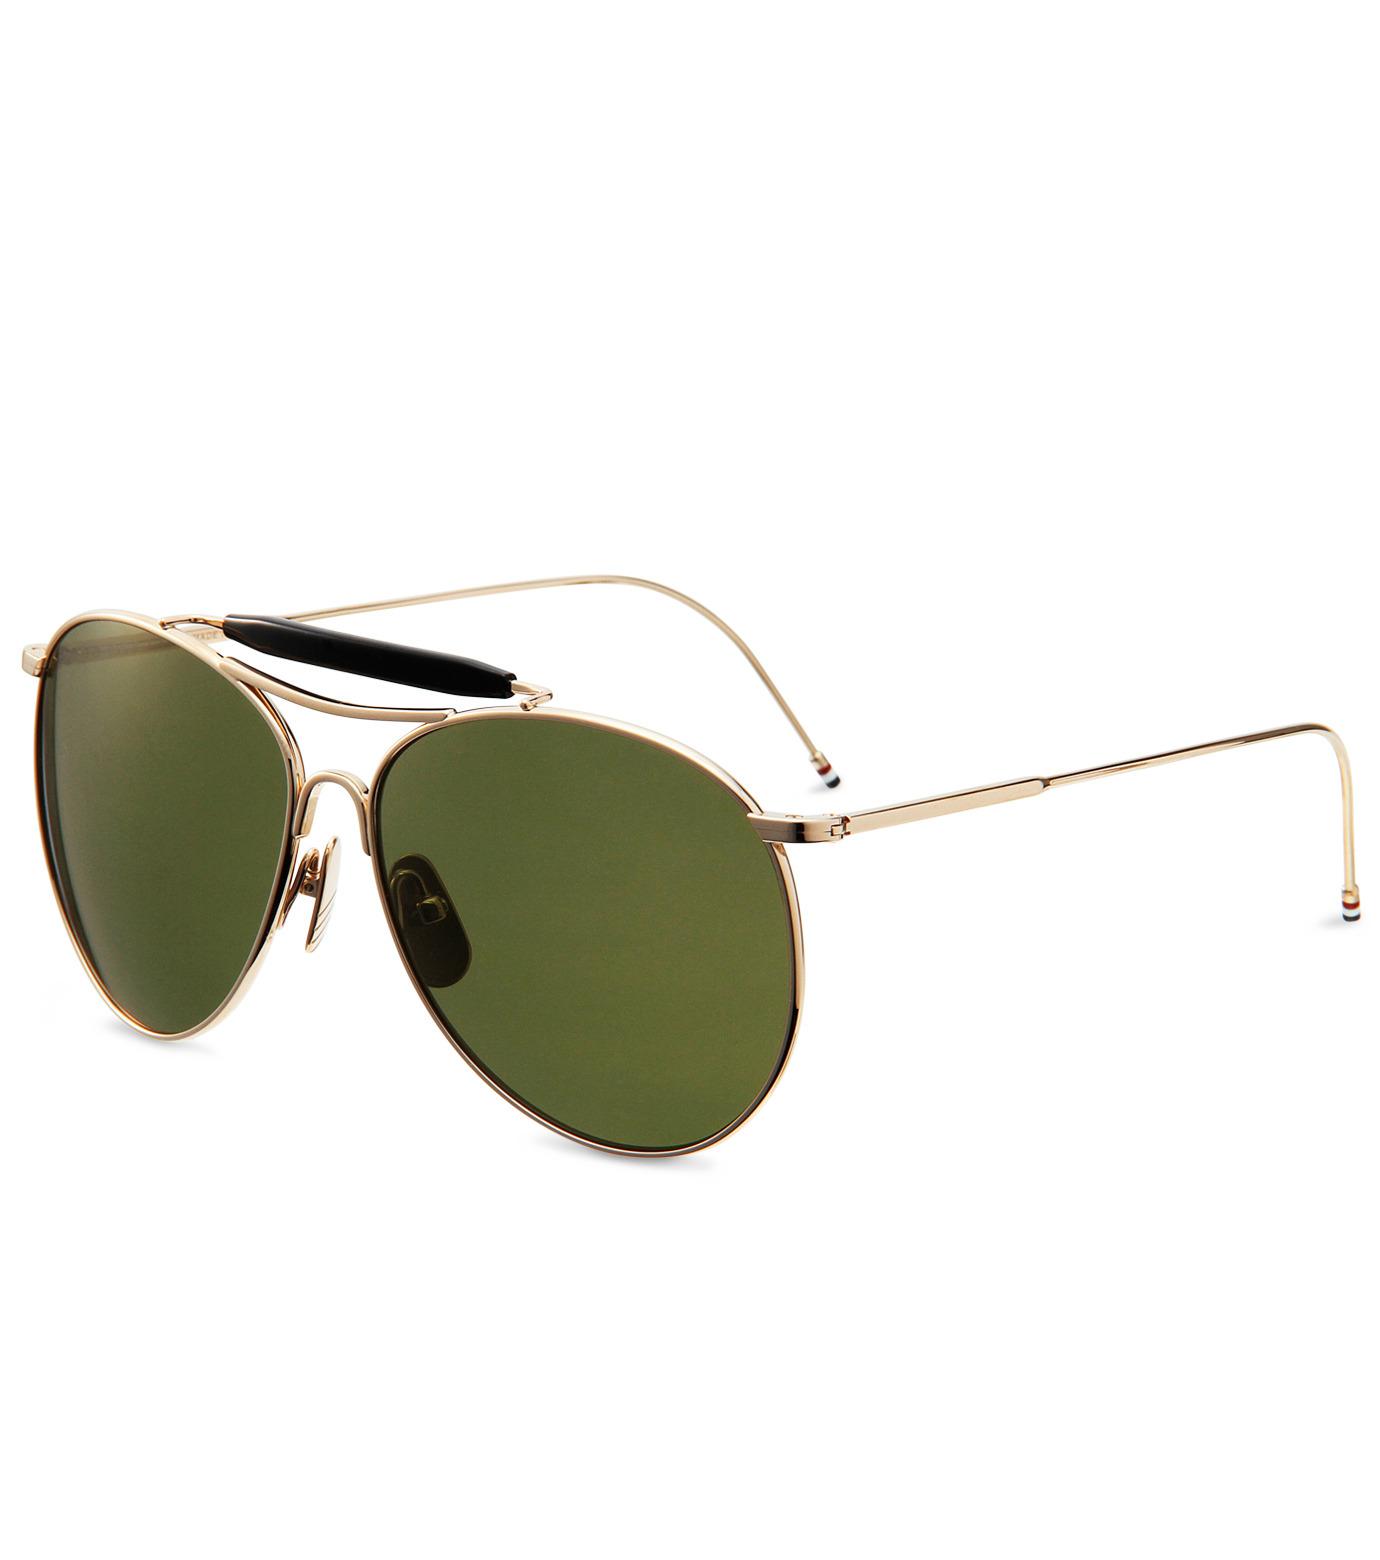 Thom Browne Eye Wear(トム・ブラウン・アイウェア)のShiny 12k gold-GOLD(アイウェア/eyewear)-TB-020B-T-59-2 拡大詳細画像1